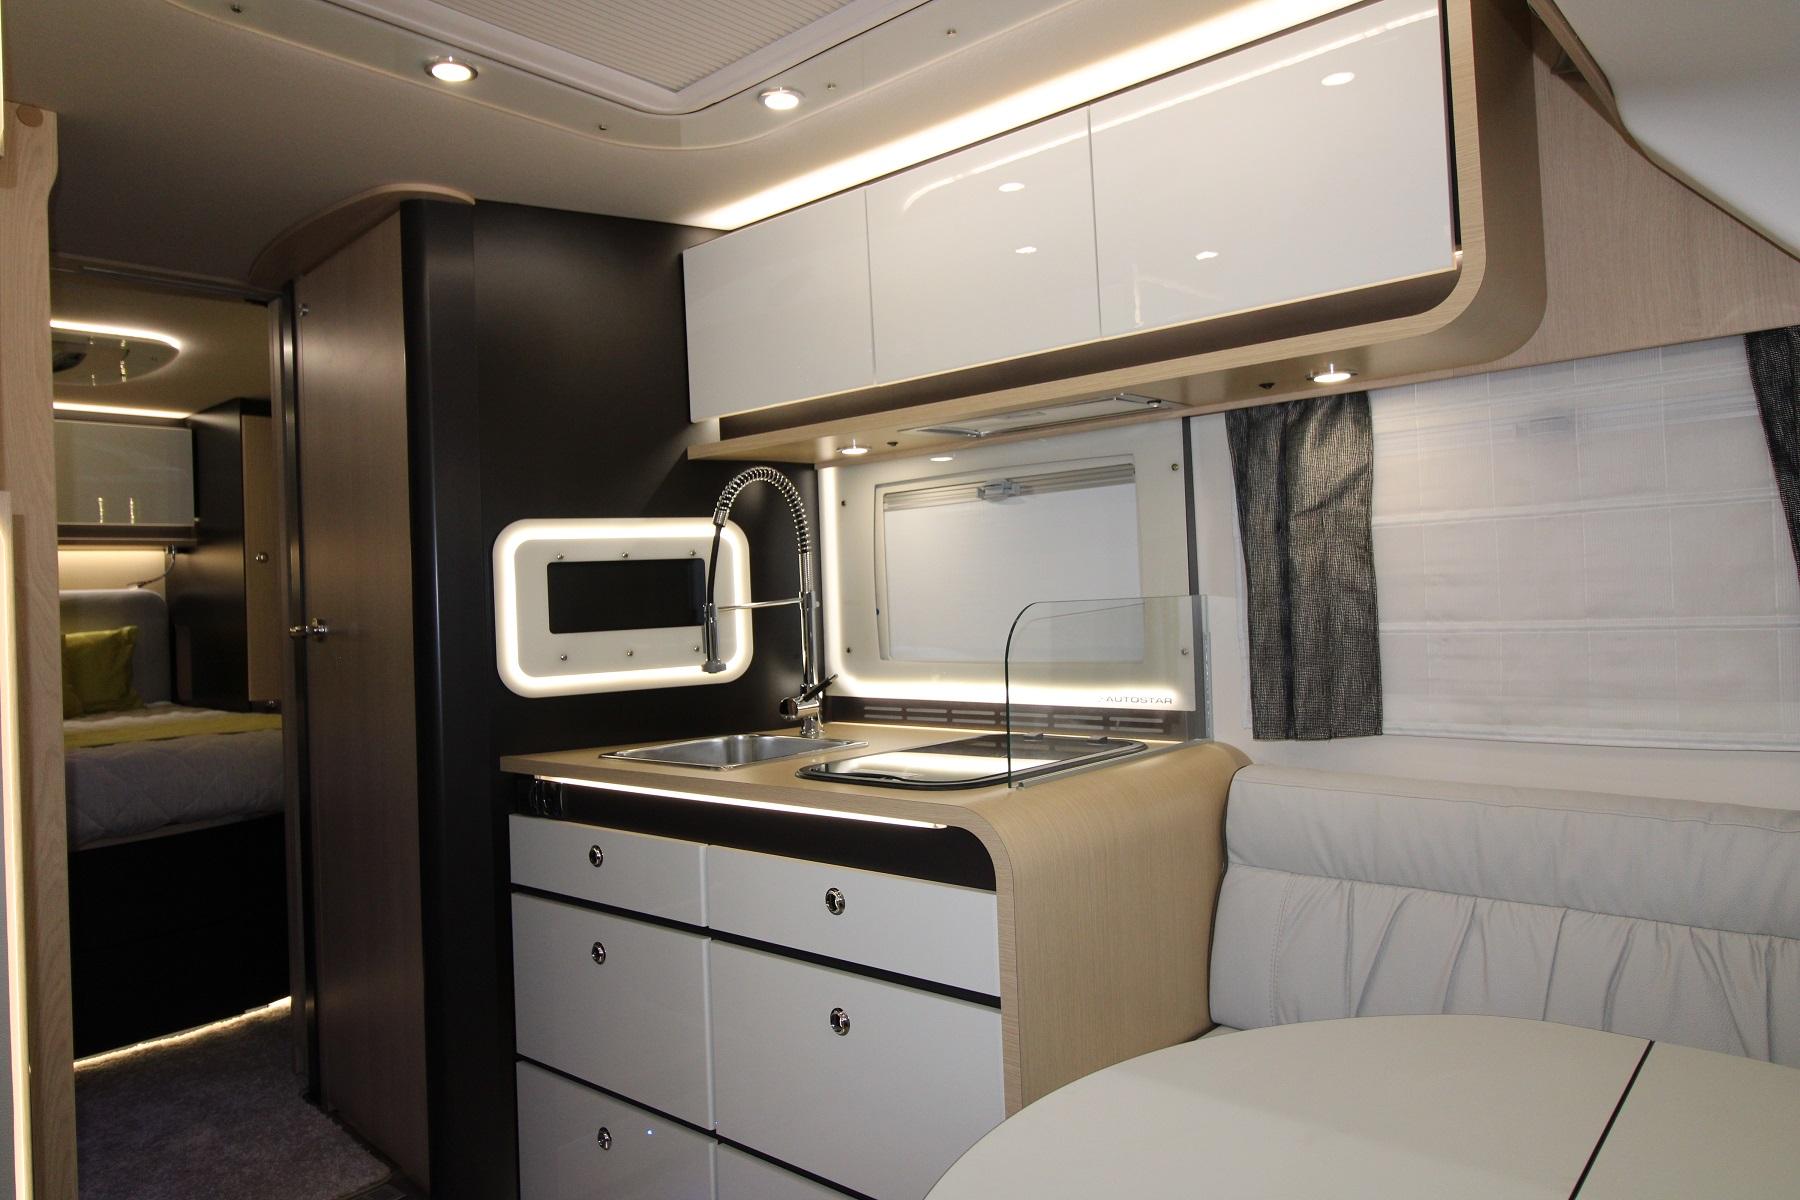 Autostar I730 Lc Prestige Design Edition - 4